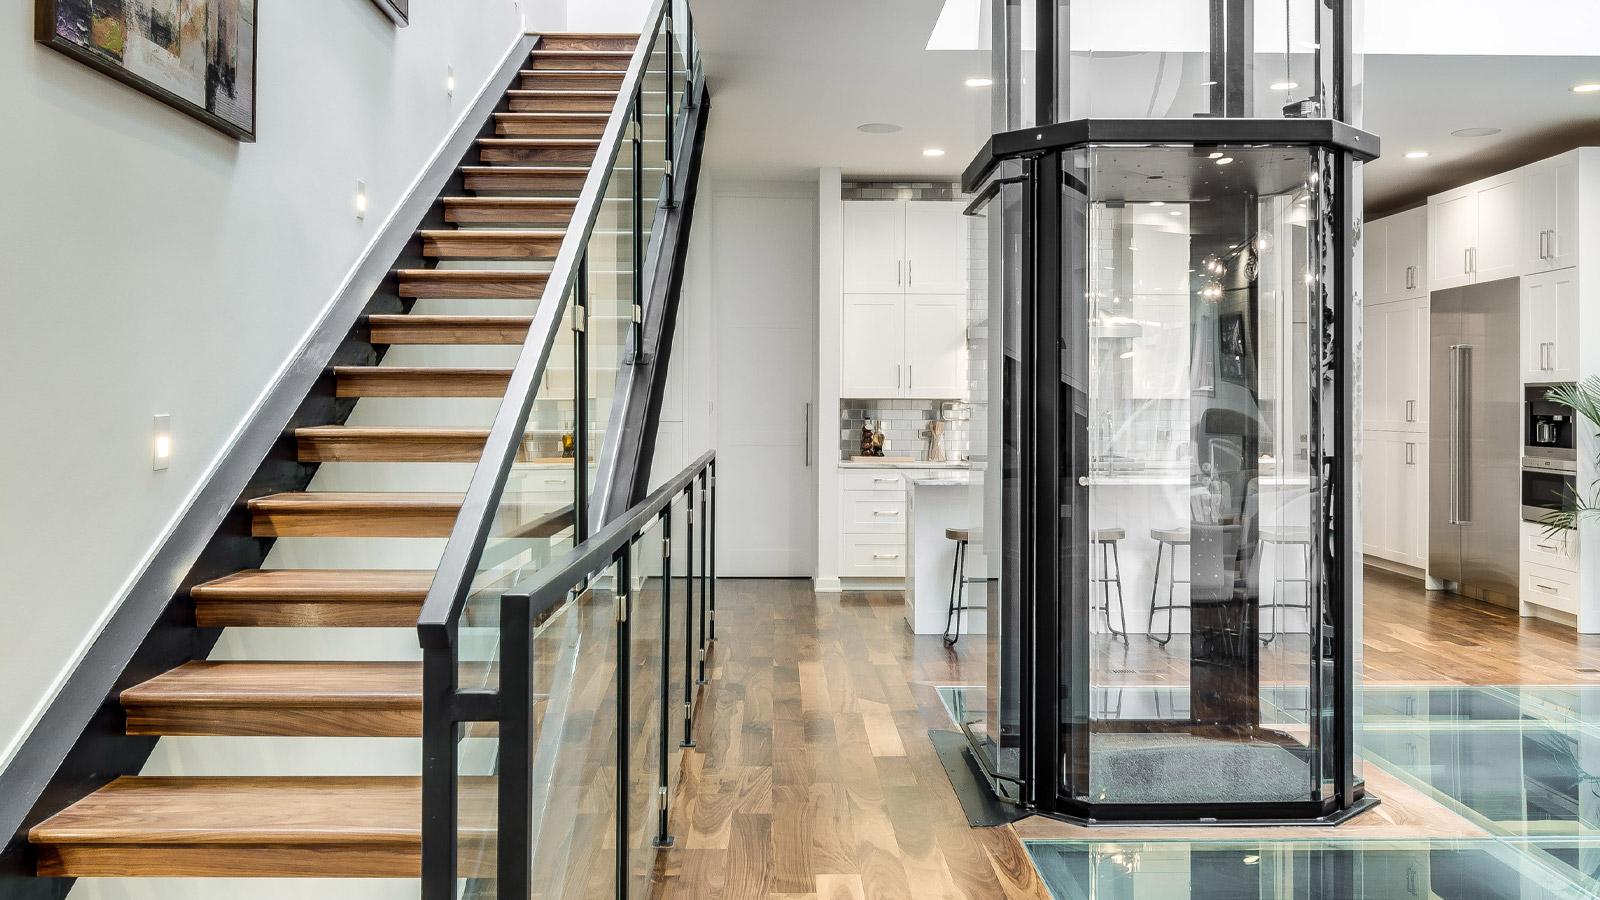 Vuelift Elevator by Savaria, octagonal profile